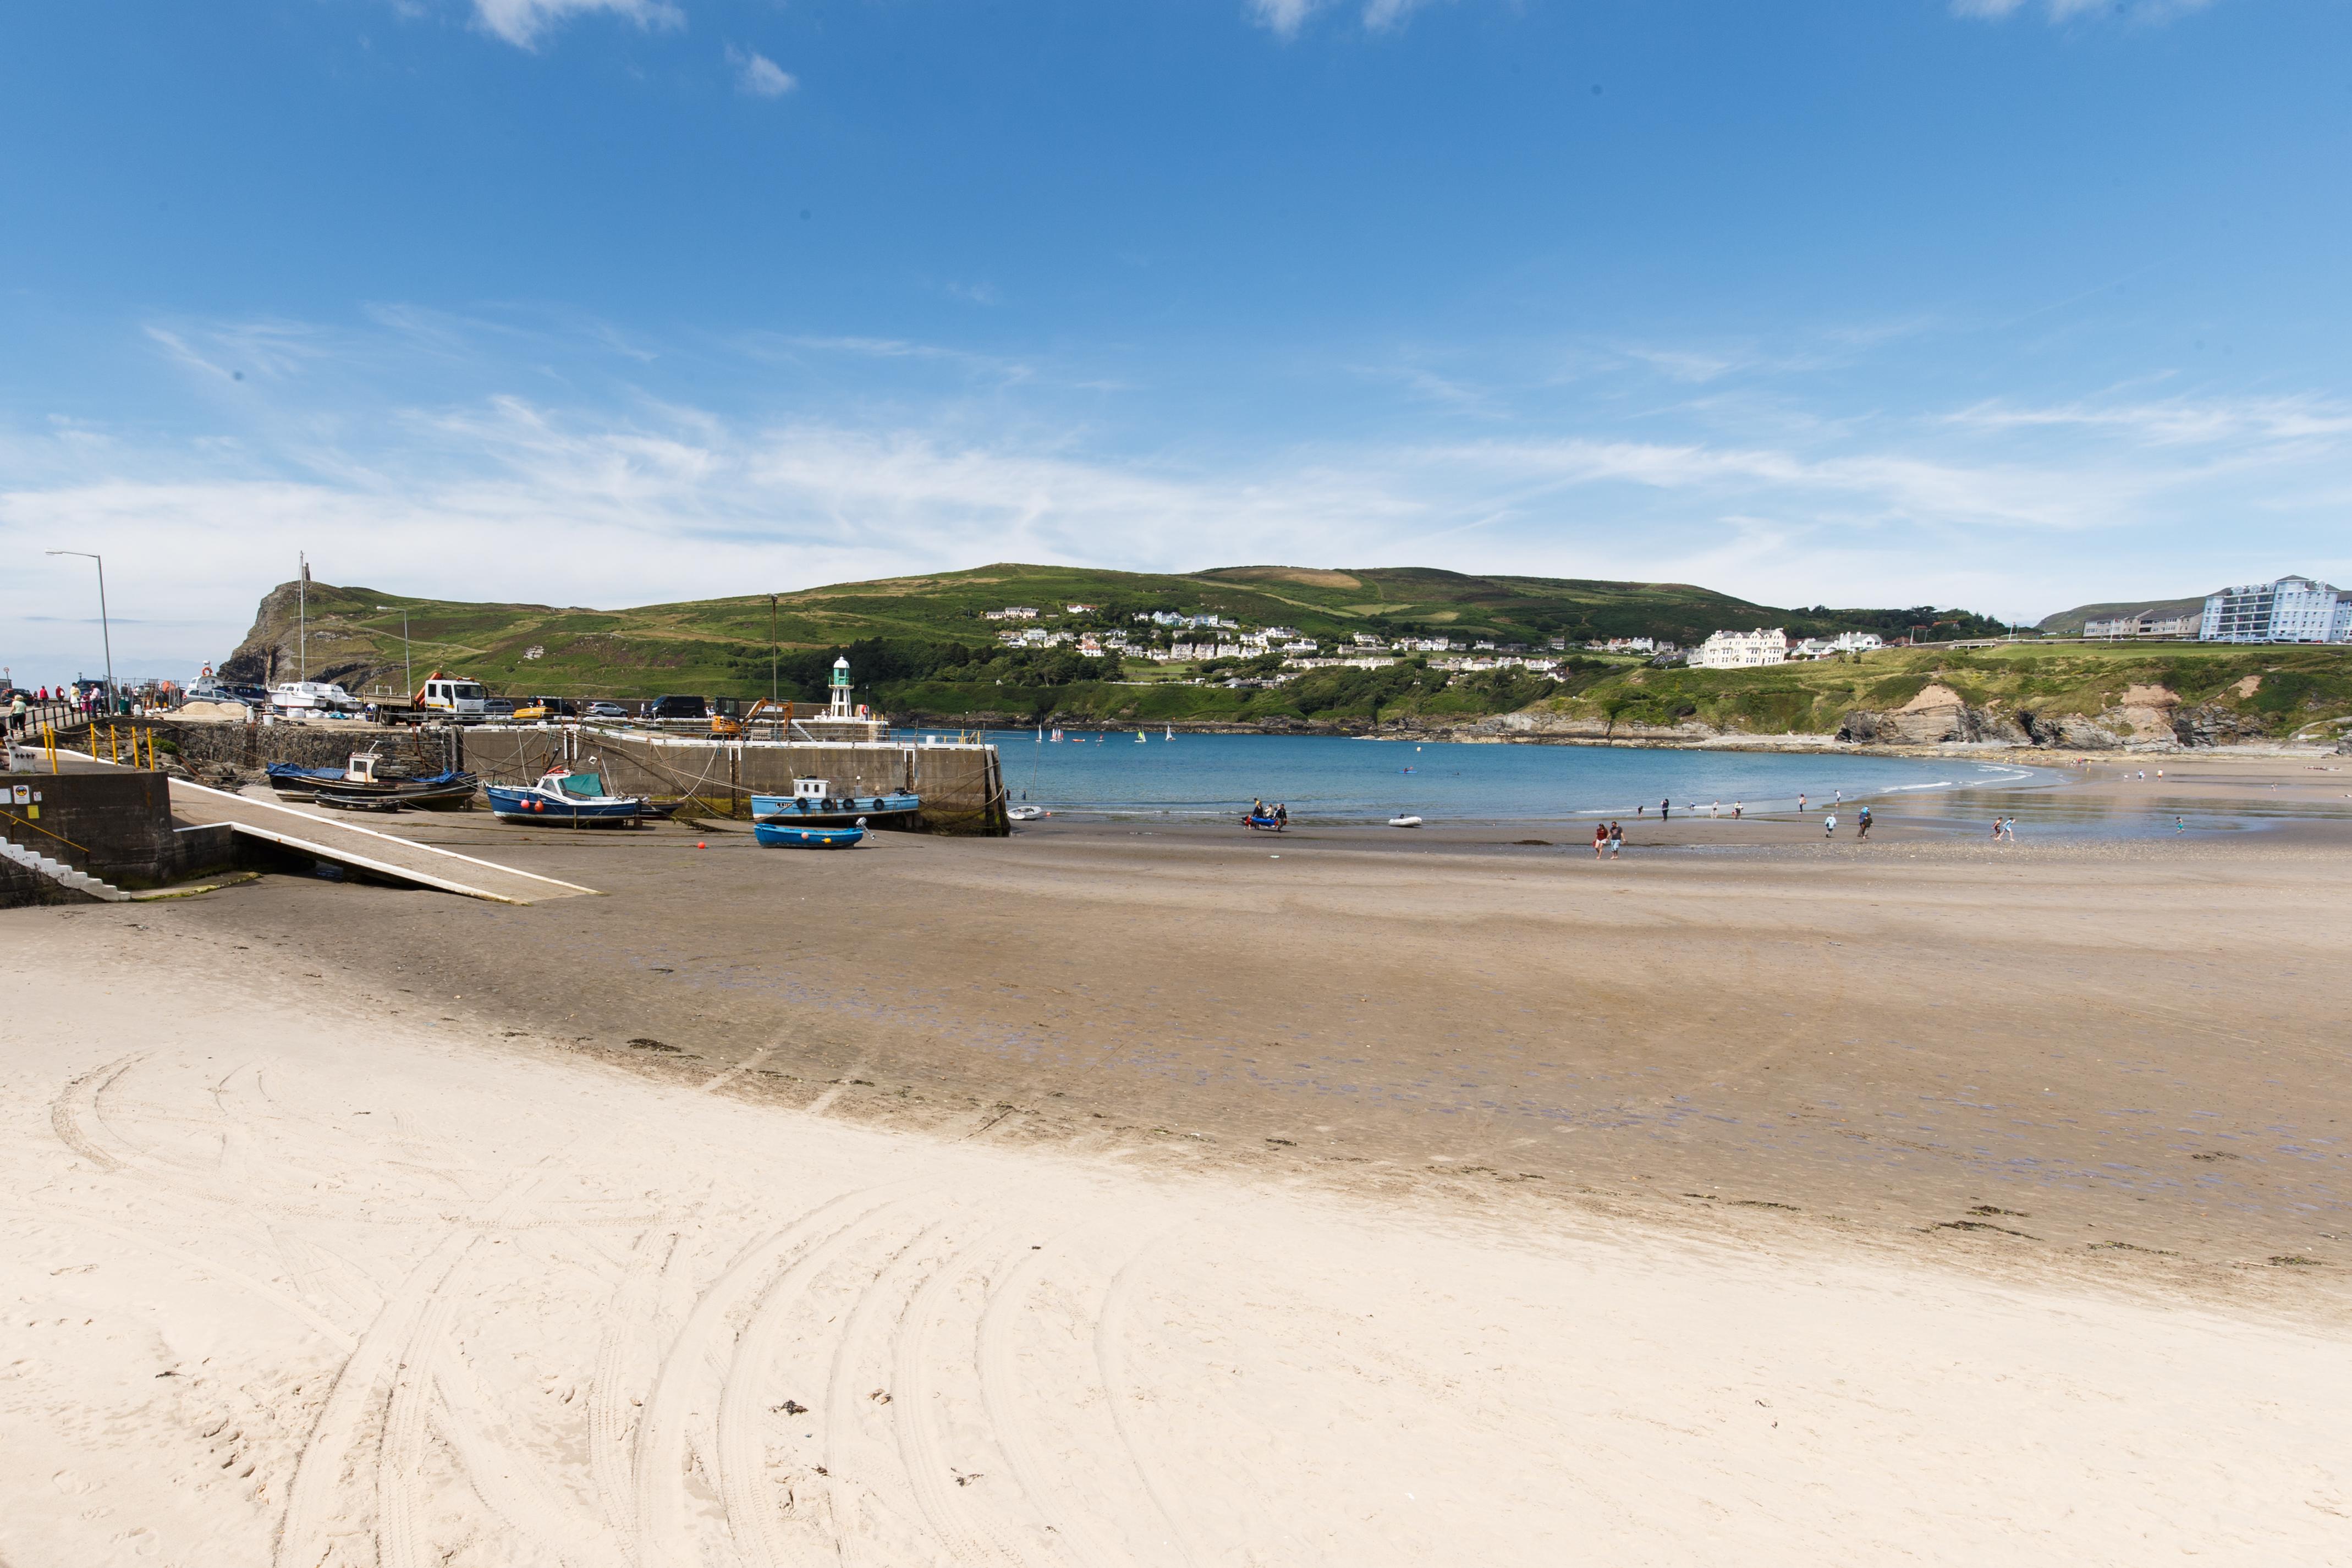 Port Erin's beautiful sandy beach